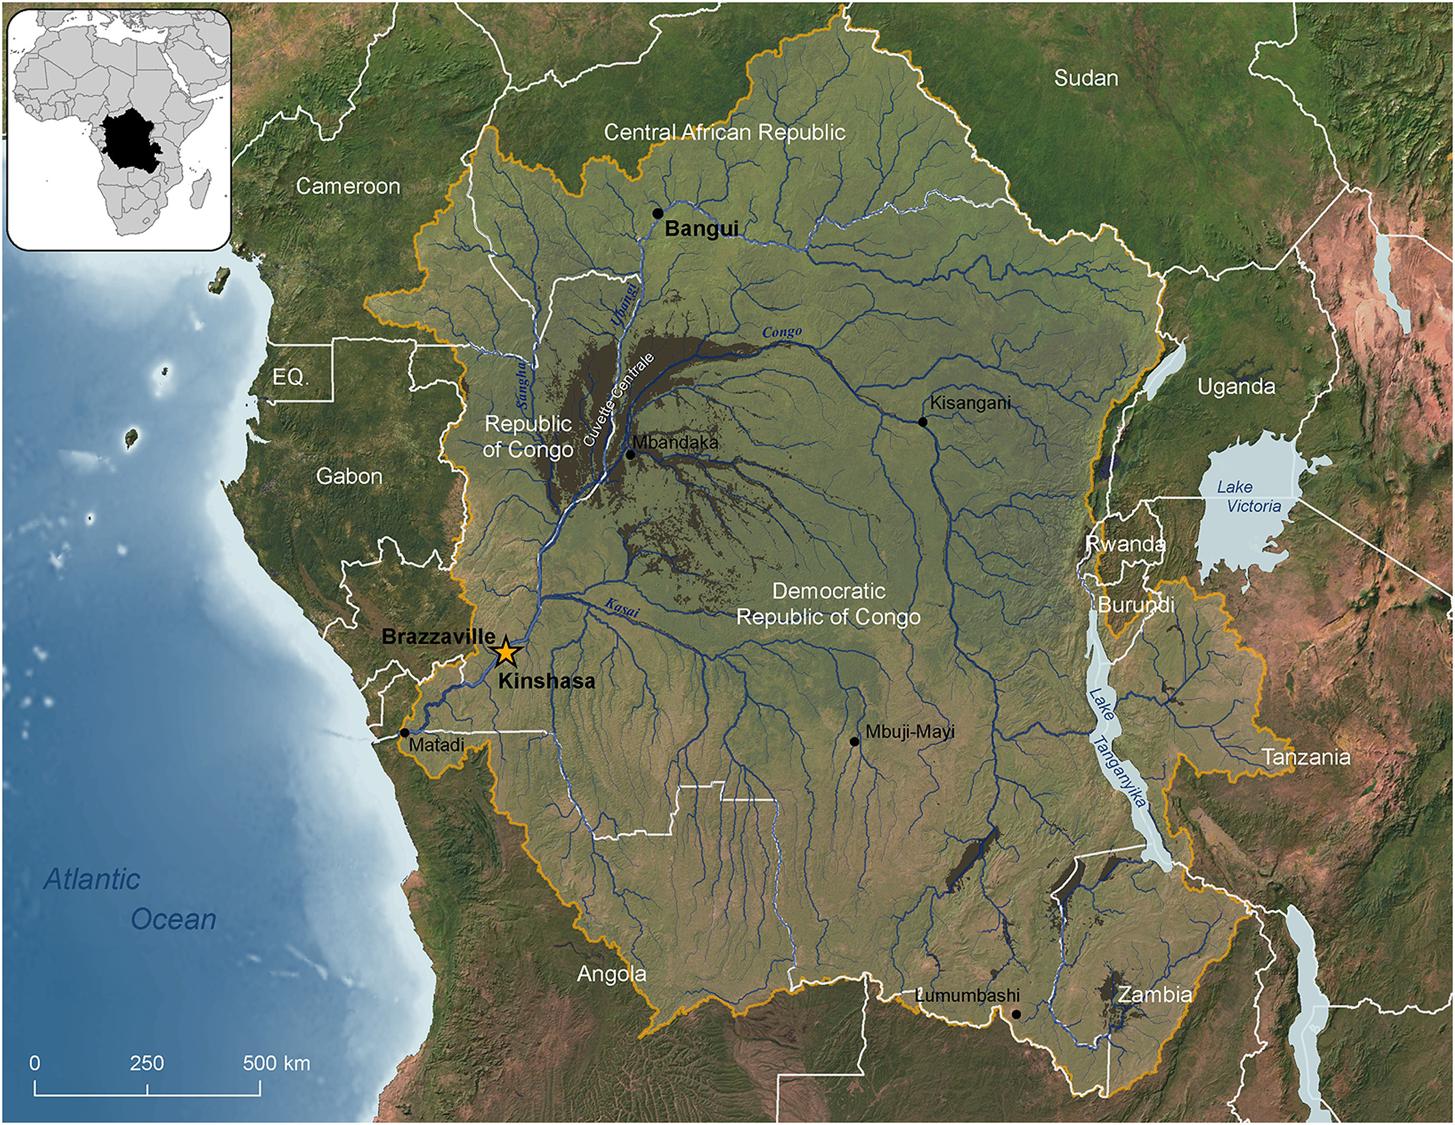 Map of Congo Basin